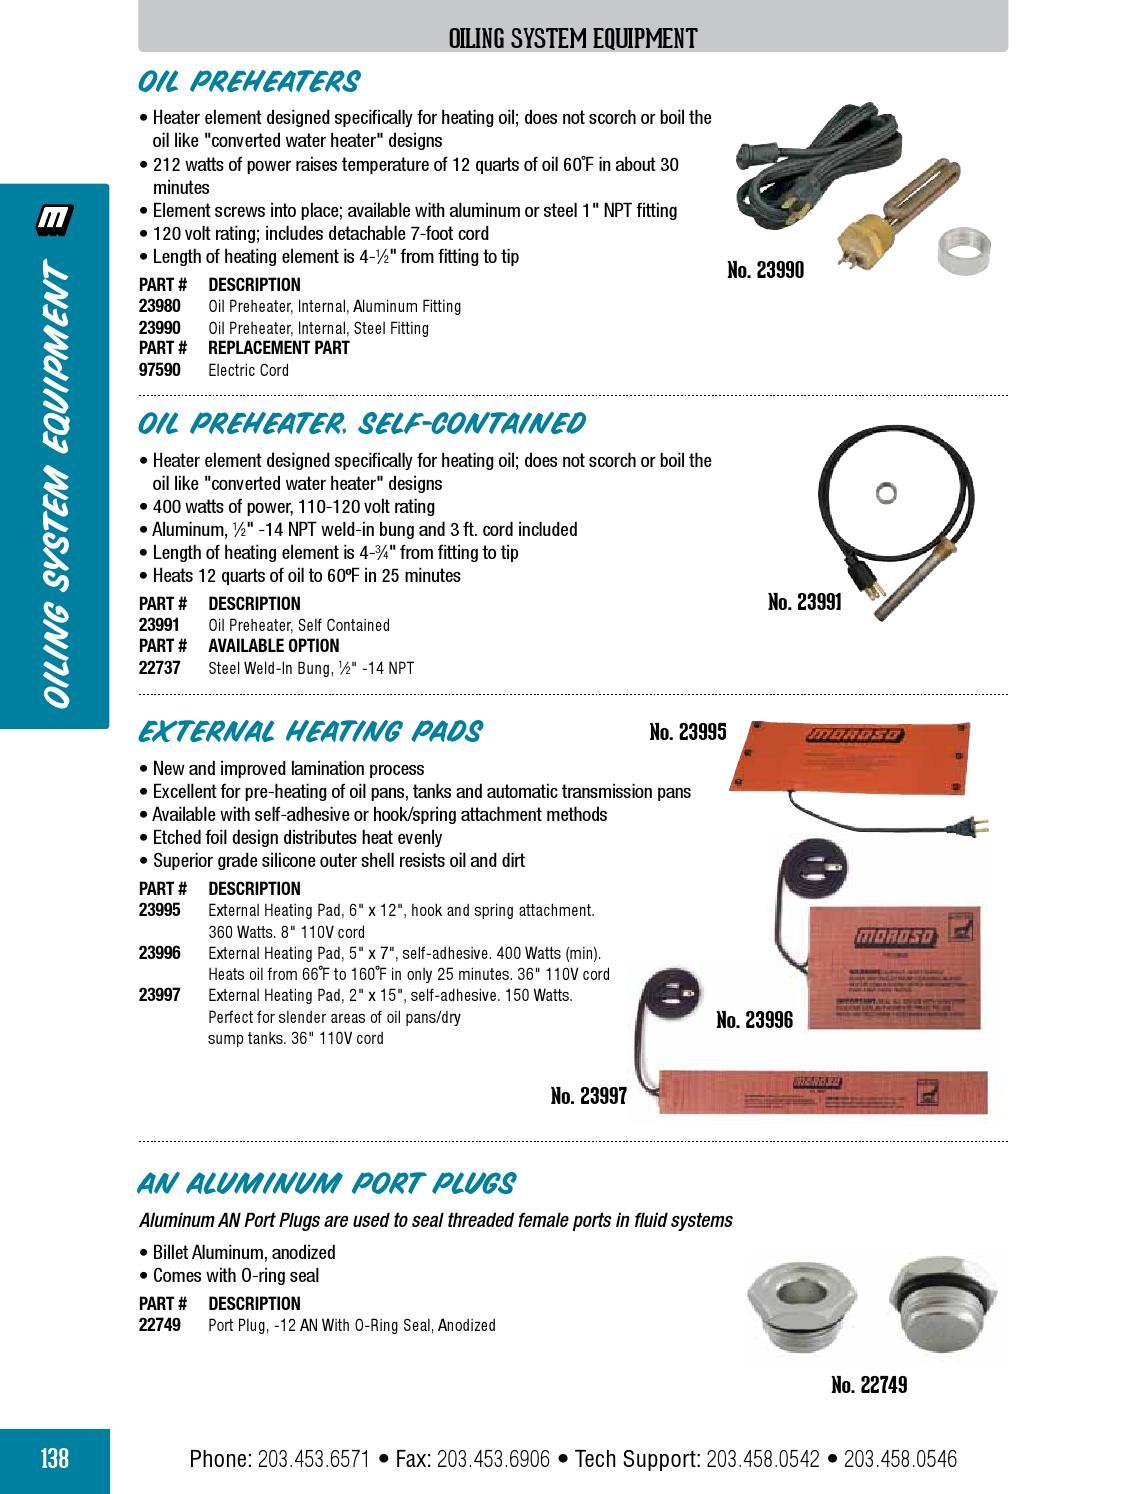 Moroso 23990 Steel Oil Pre-Heater